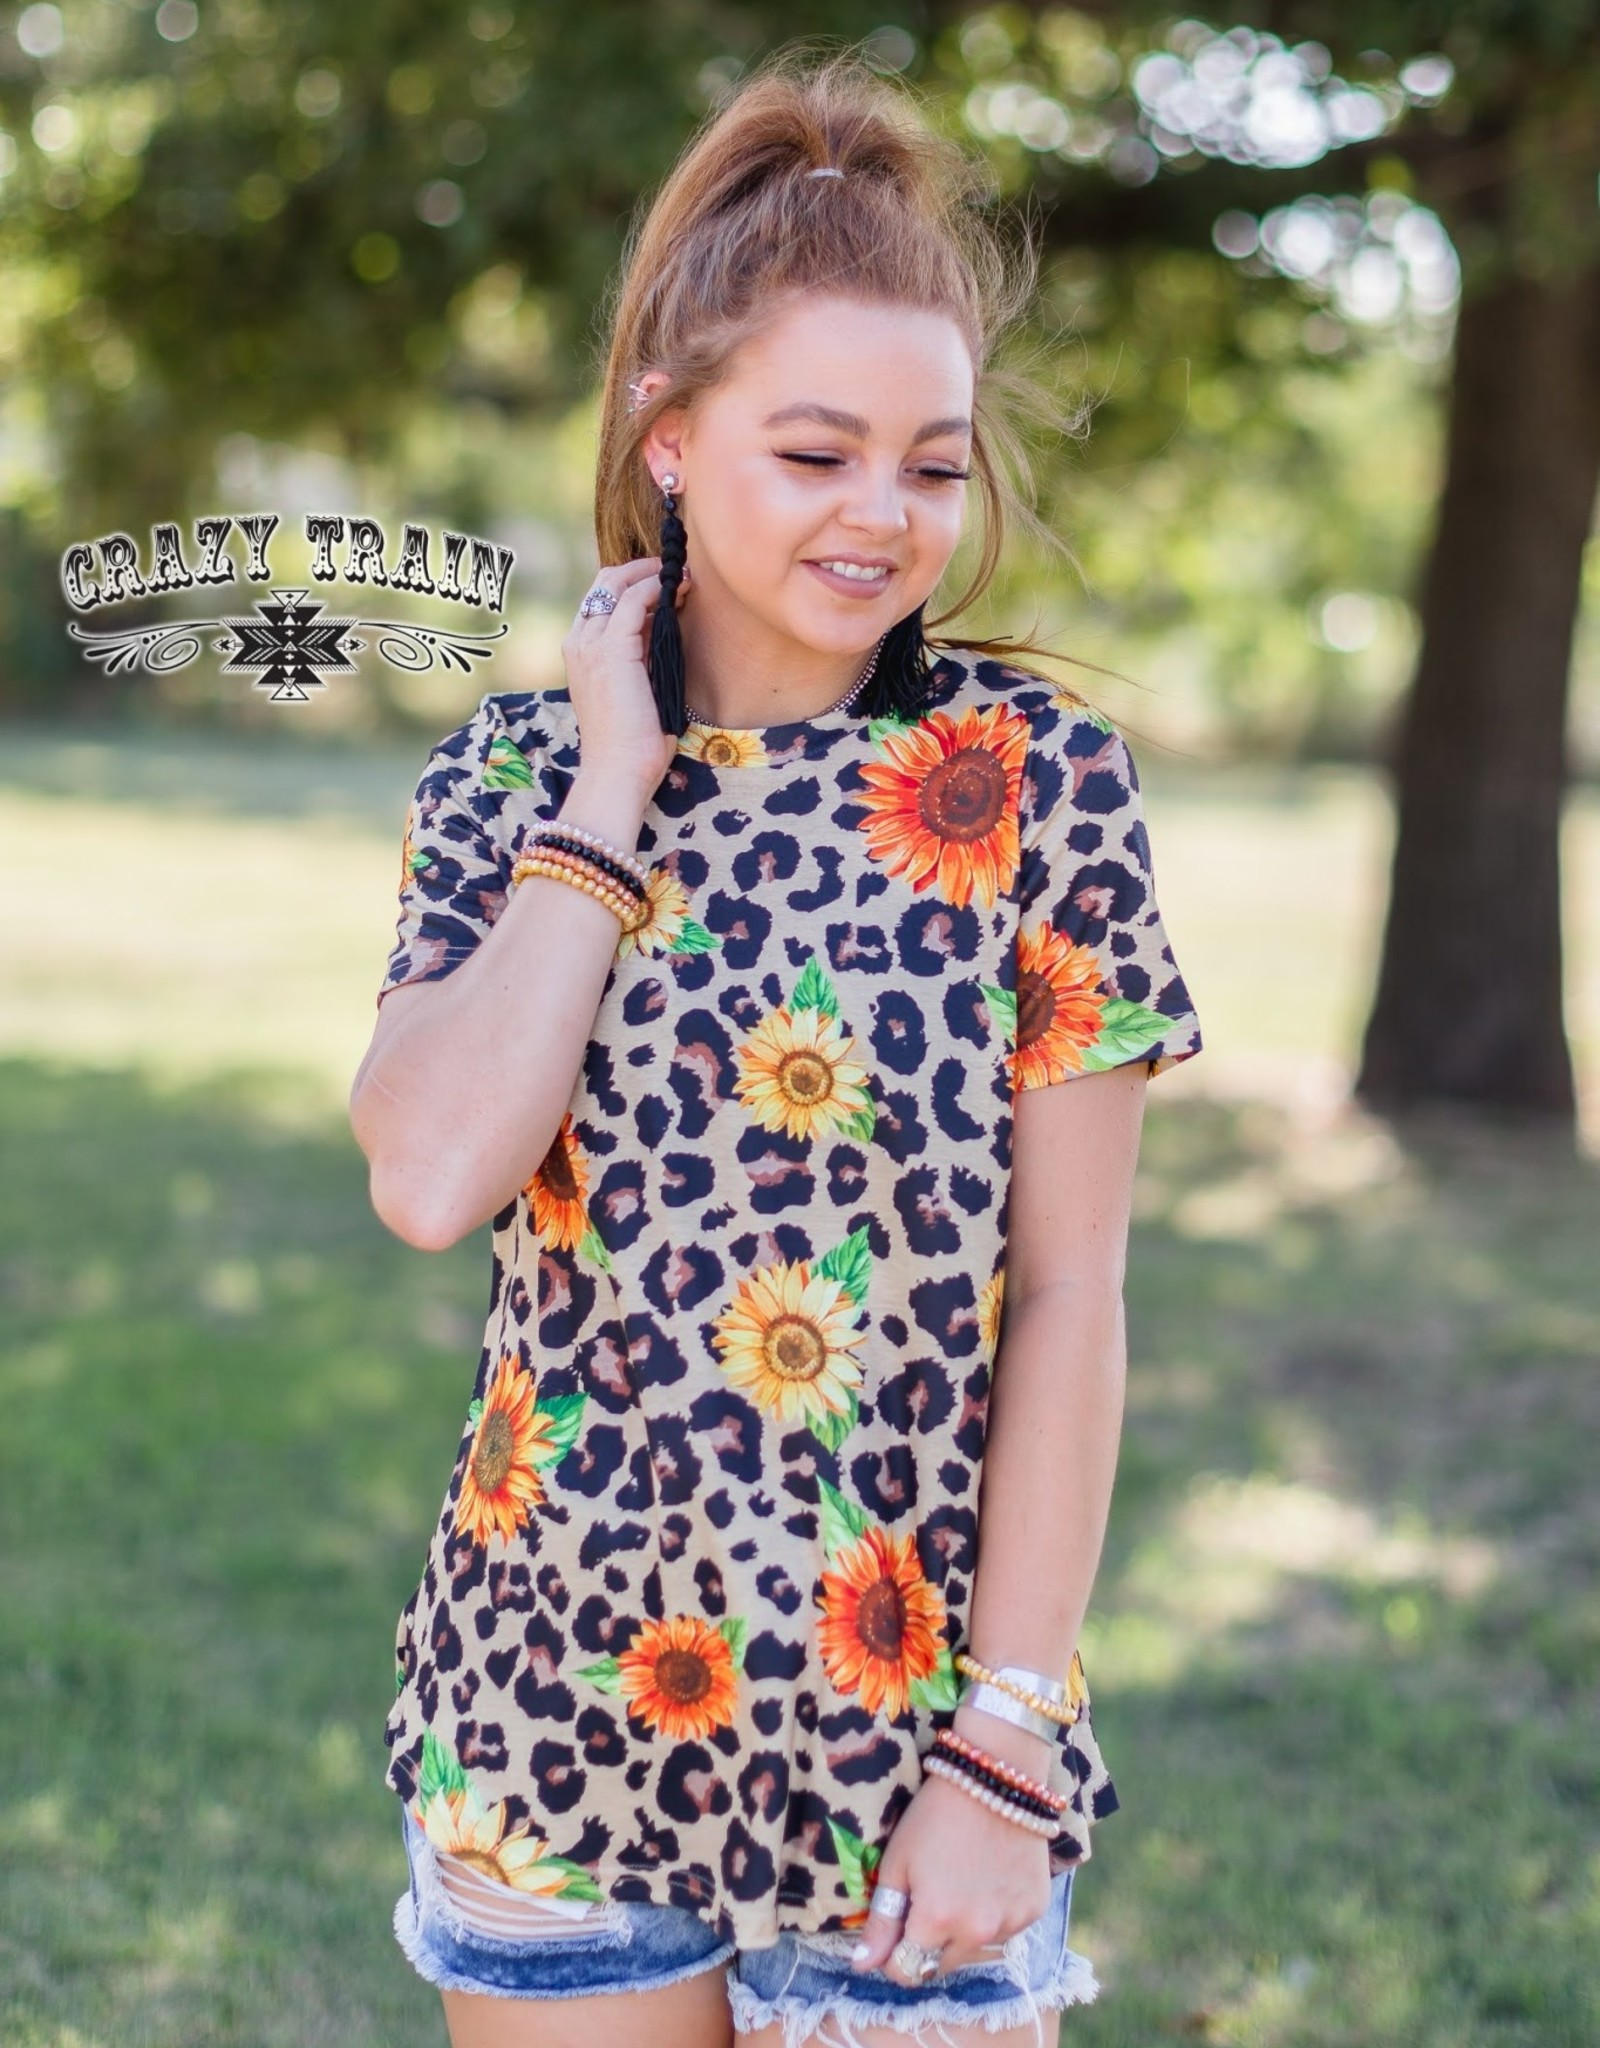 Crazy Train Crazy Train Sangria Sunrise Leopard Sunflower T-Shirt